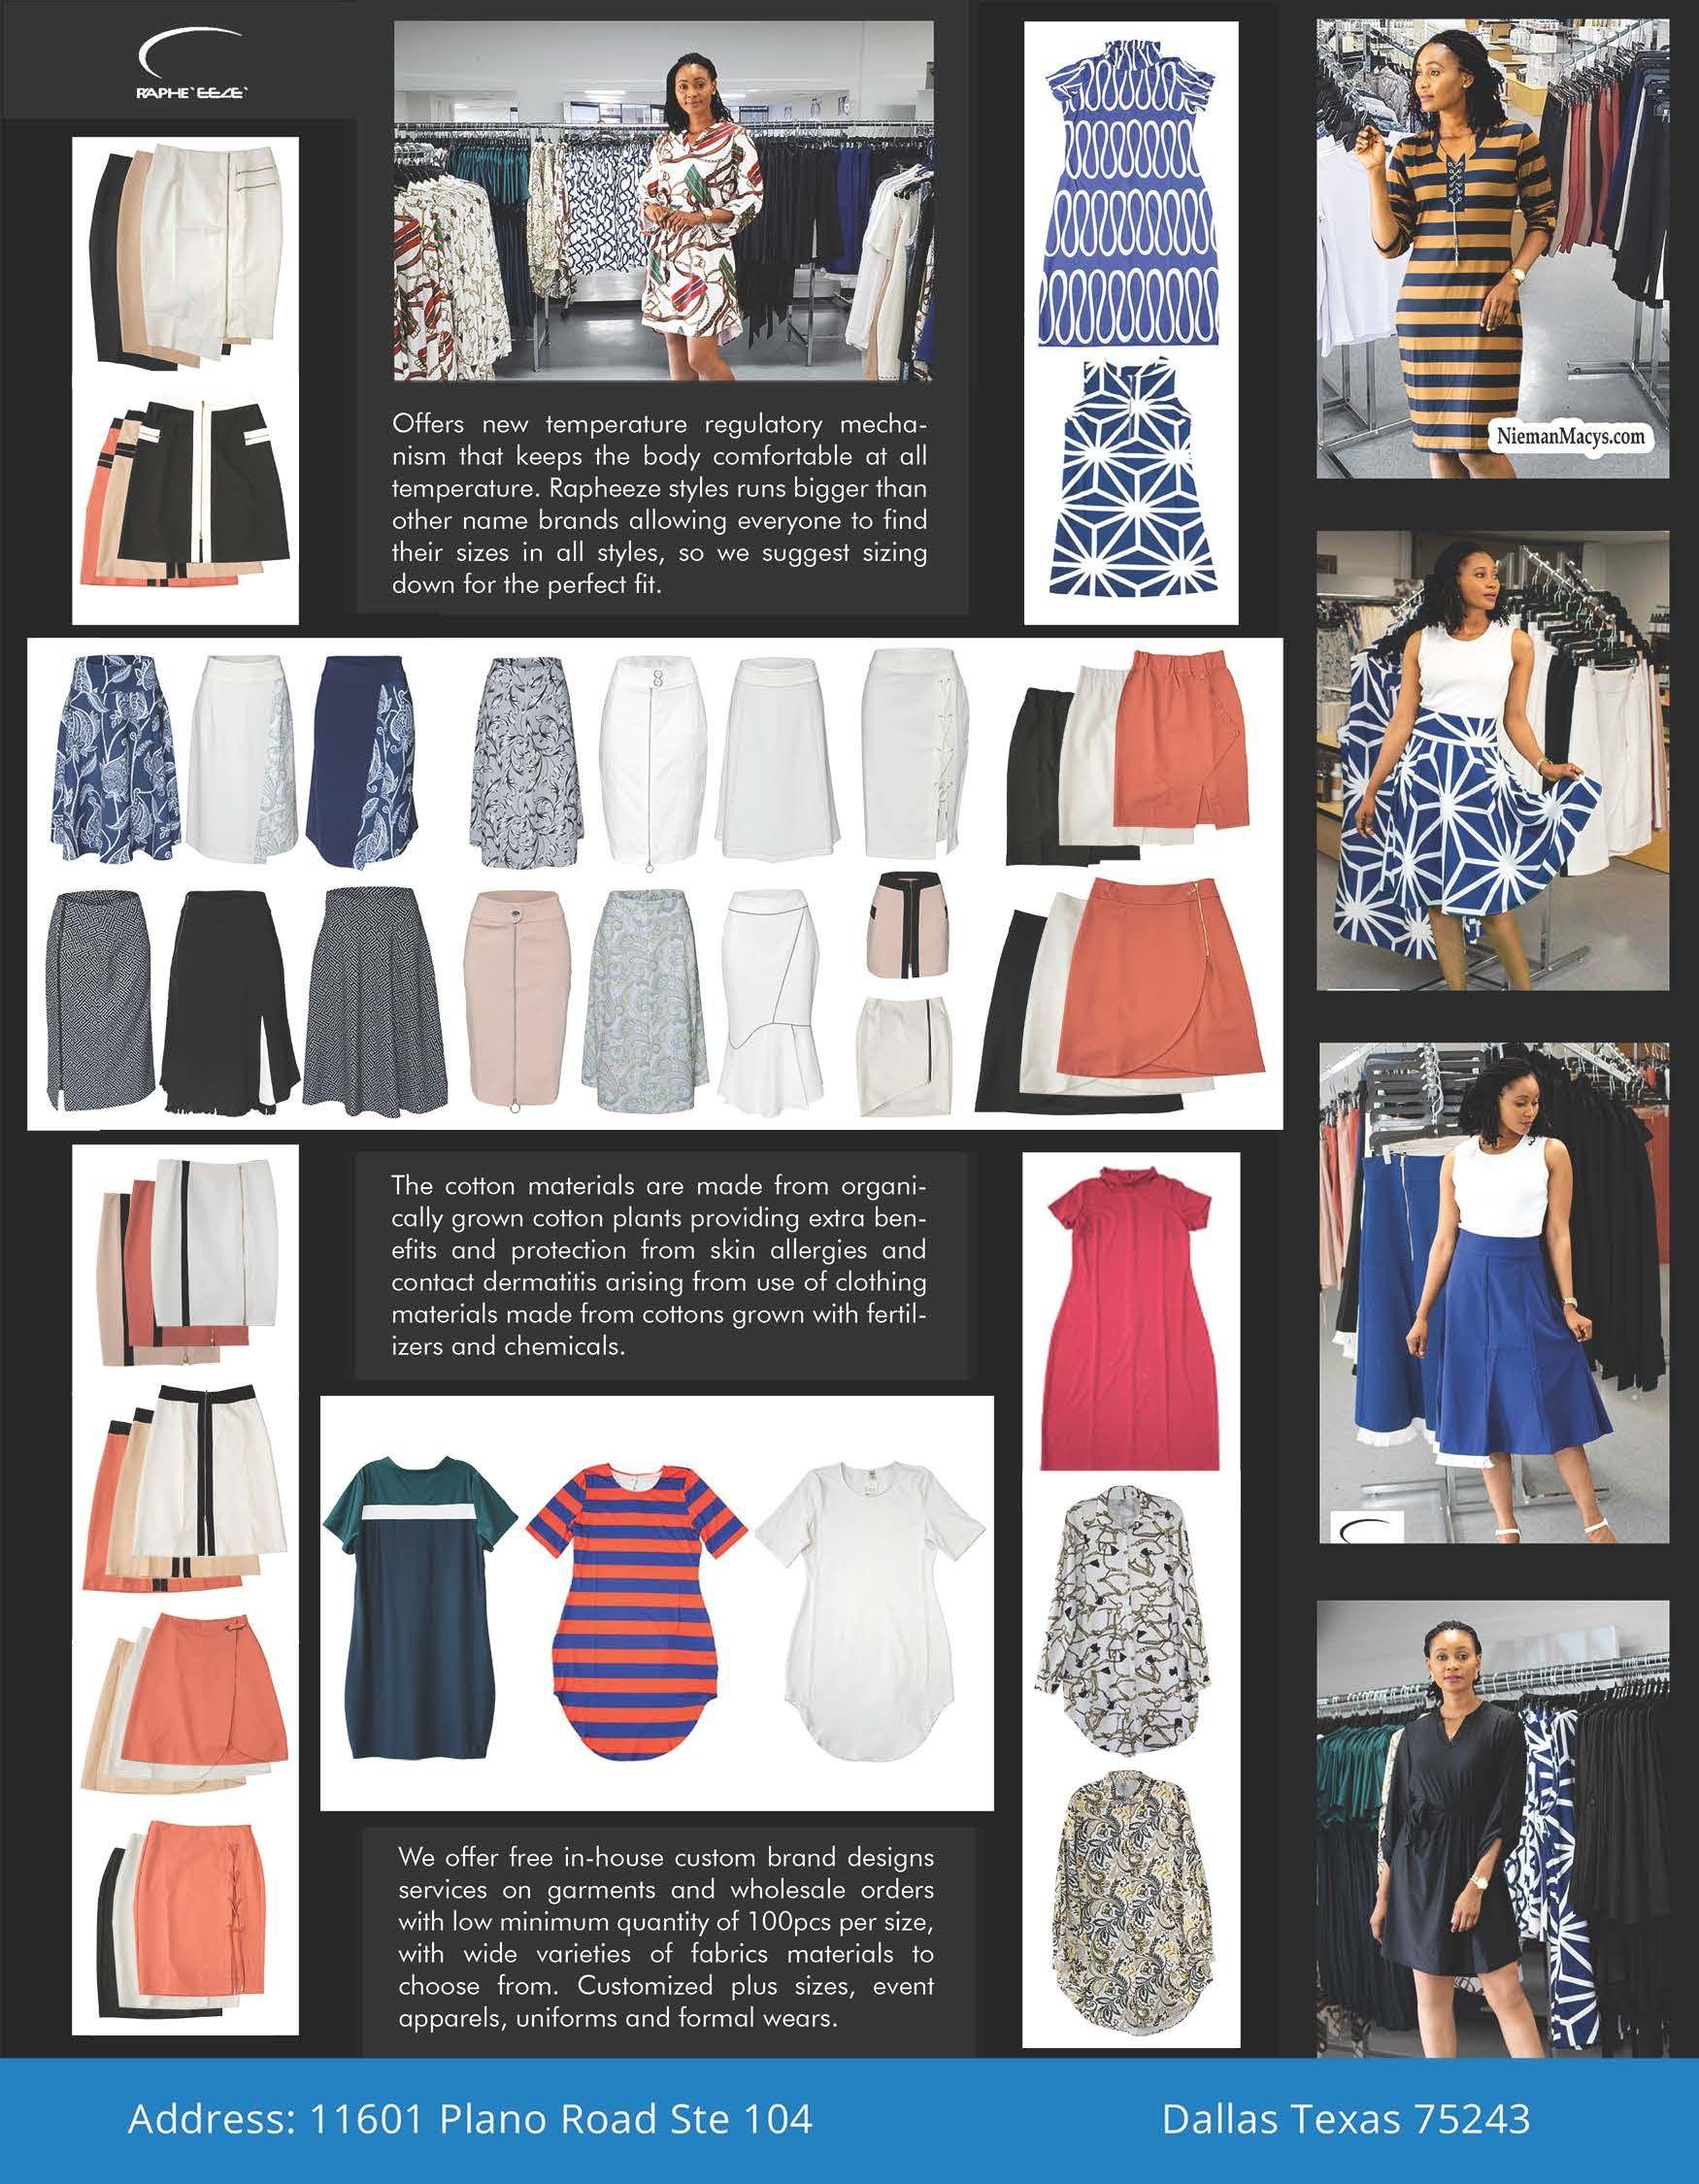 Top U S A Custom Brand Fashion Design Manufacturer Wholesale Clothing Vendor Wholesale Clothing Vendors Designer Clothing Brands Top Clothing Brands